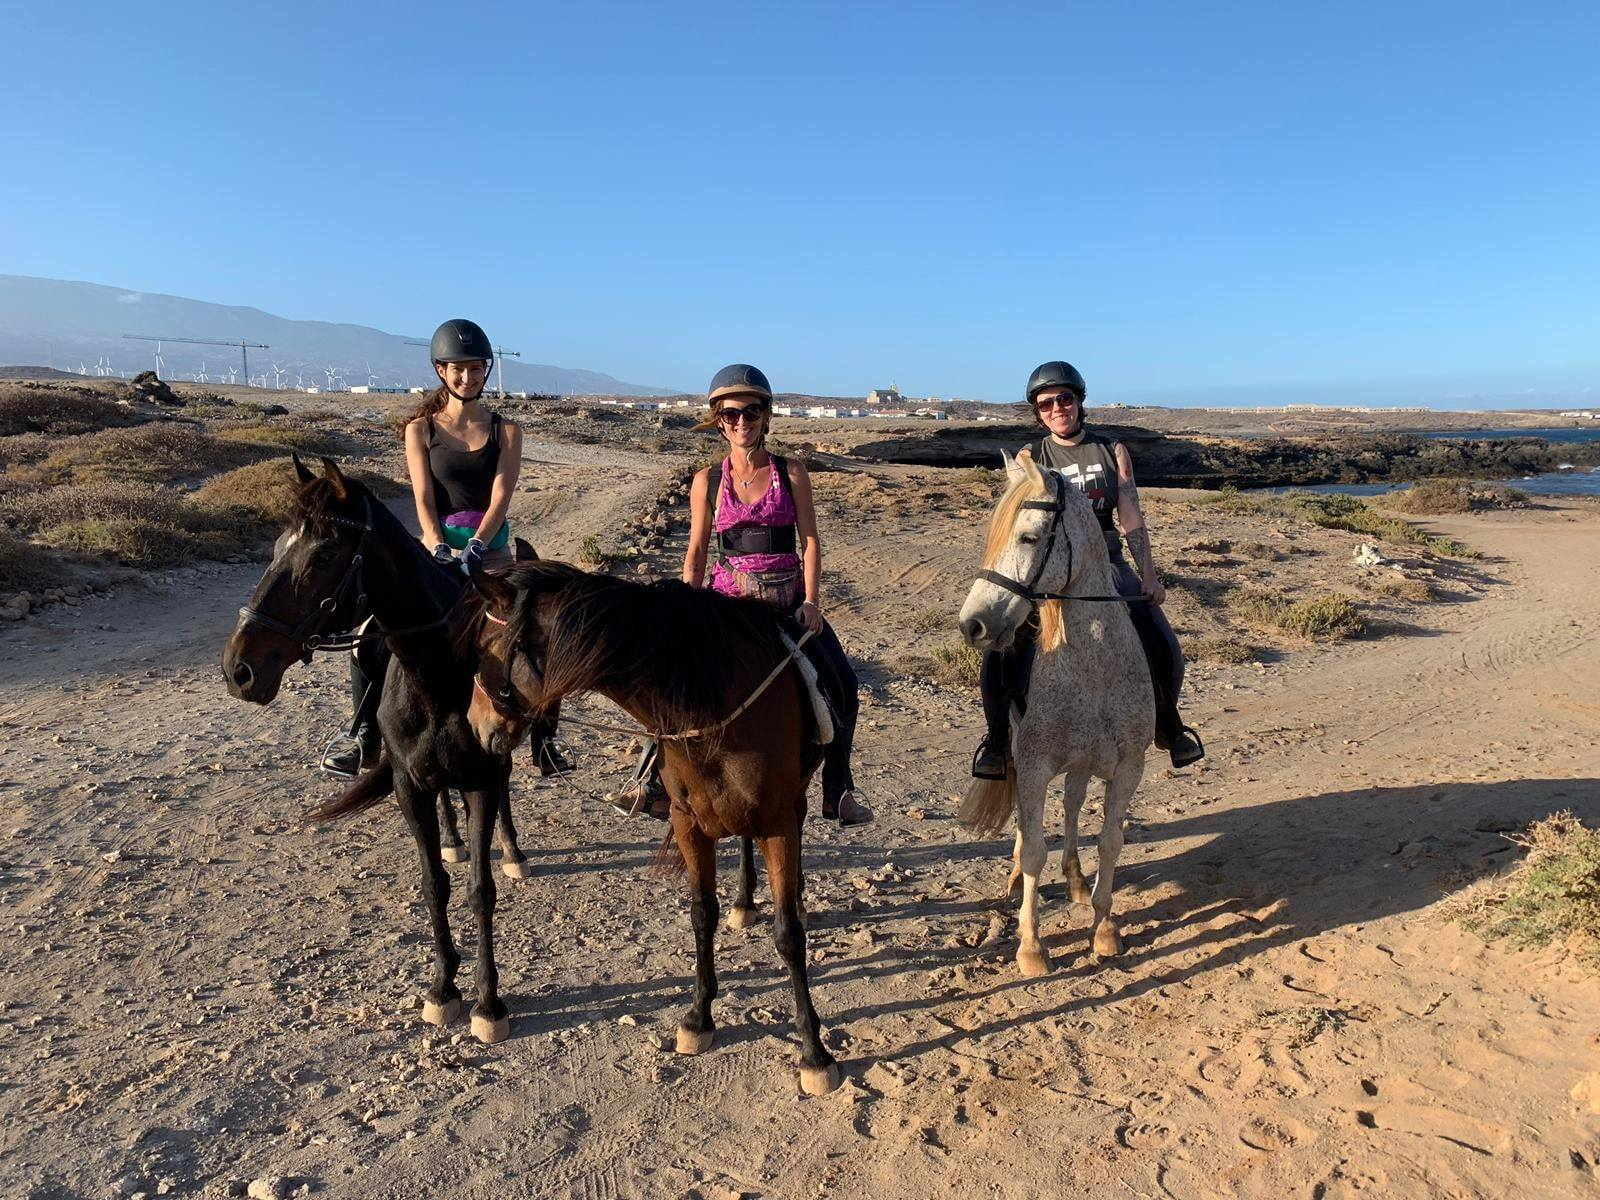 Horse sanctuary rescue horses on the beach